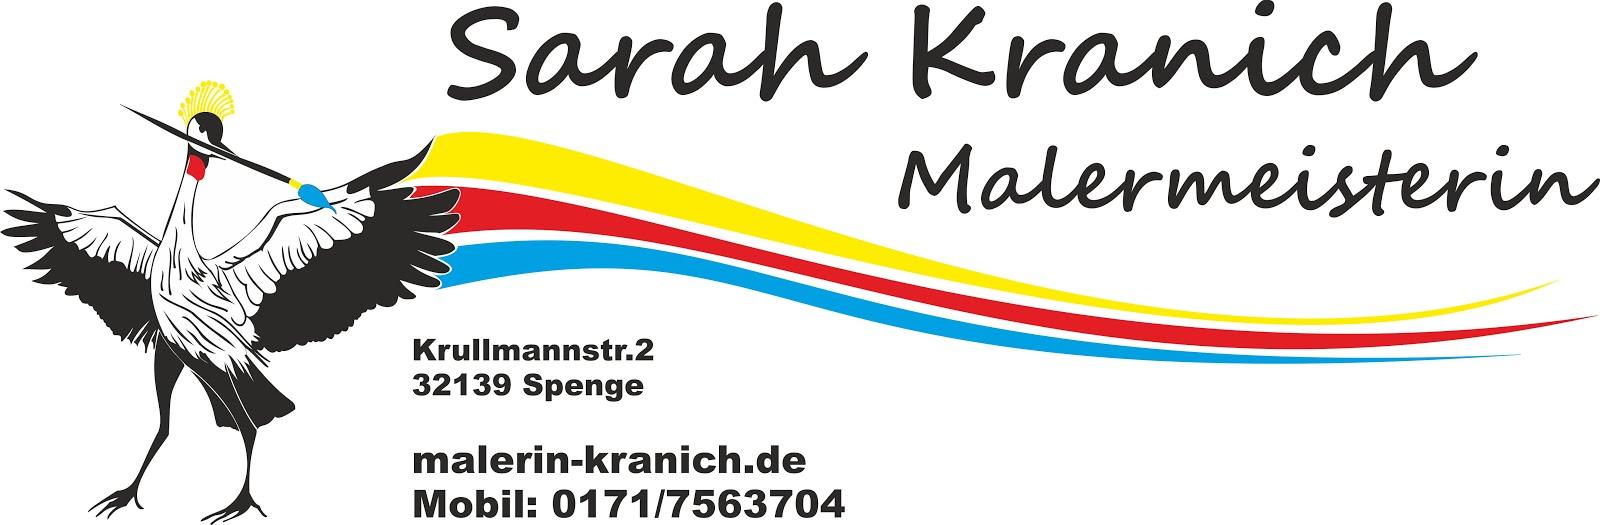 Malermeisterin Sarah Kranich